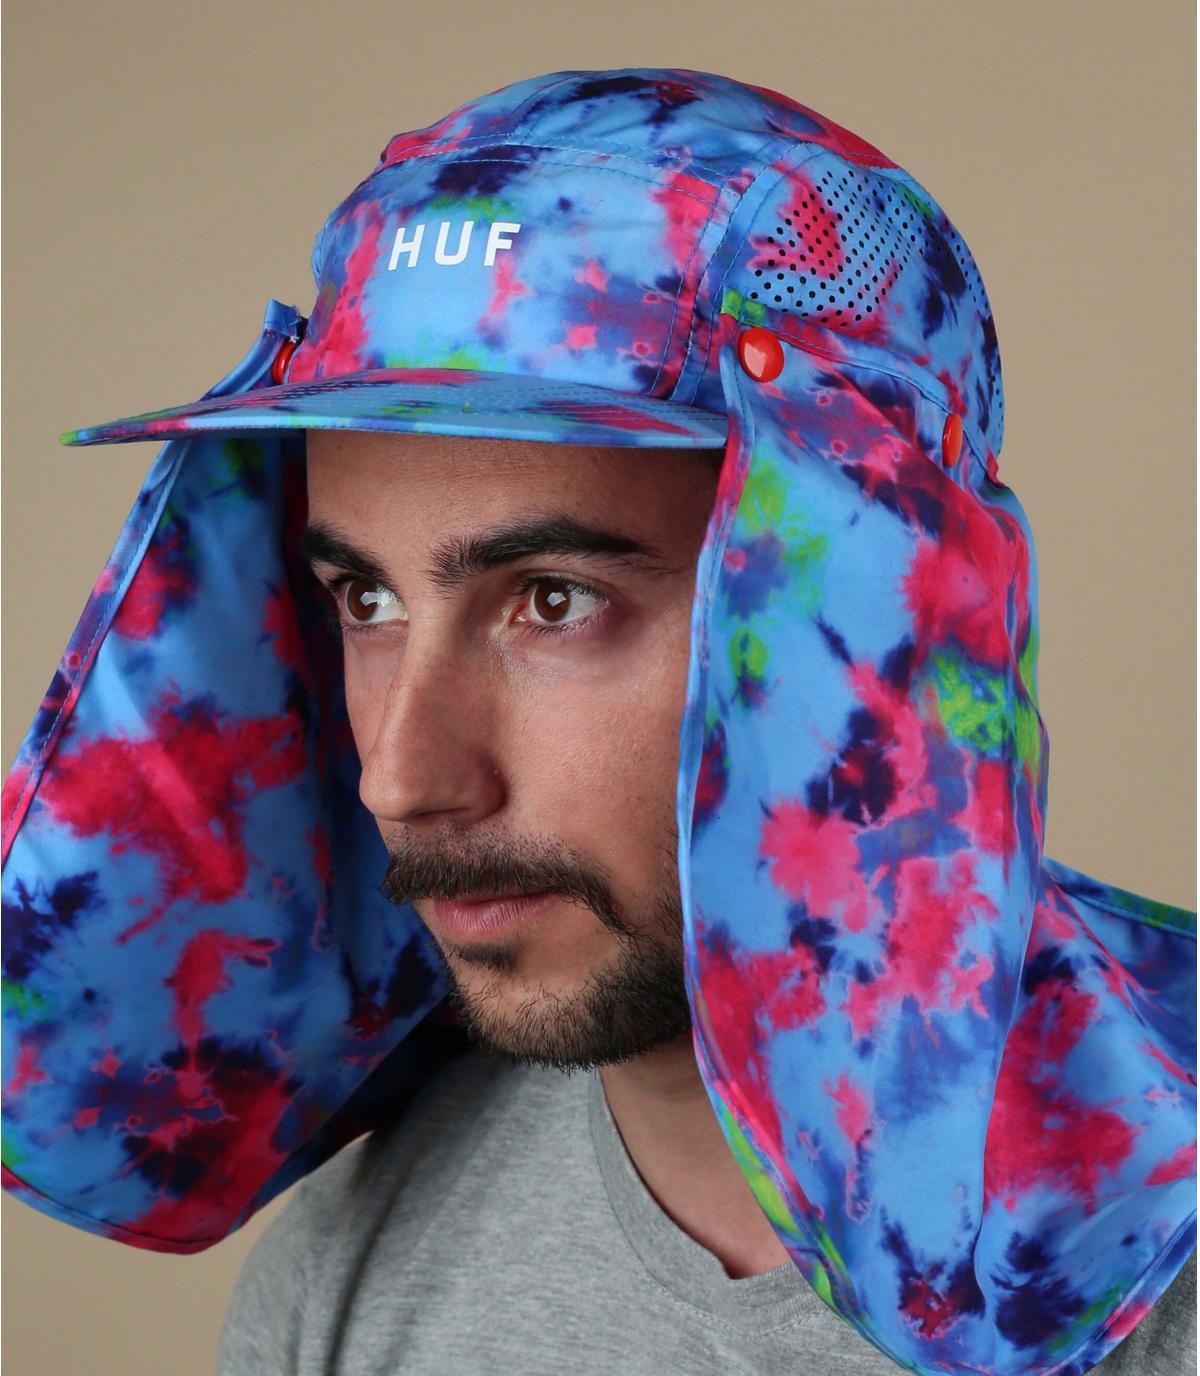 5 Huf blauw hoofdbandpaneel